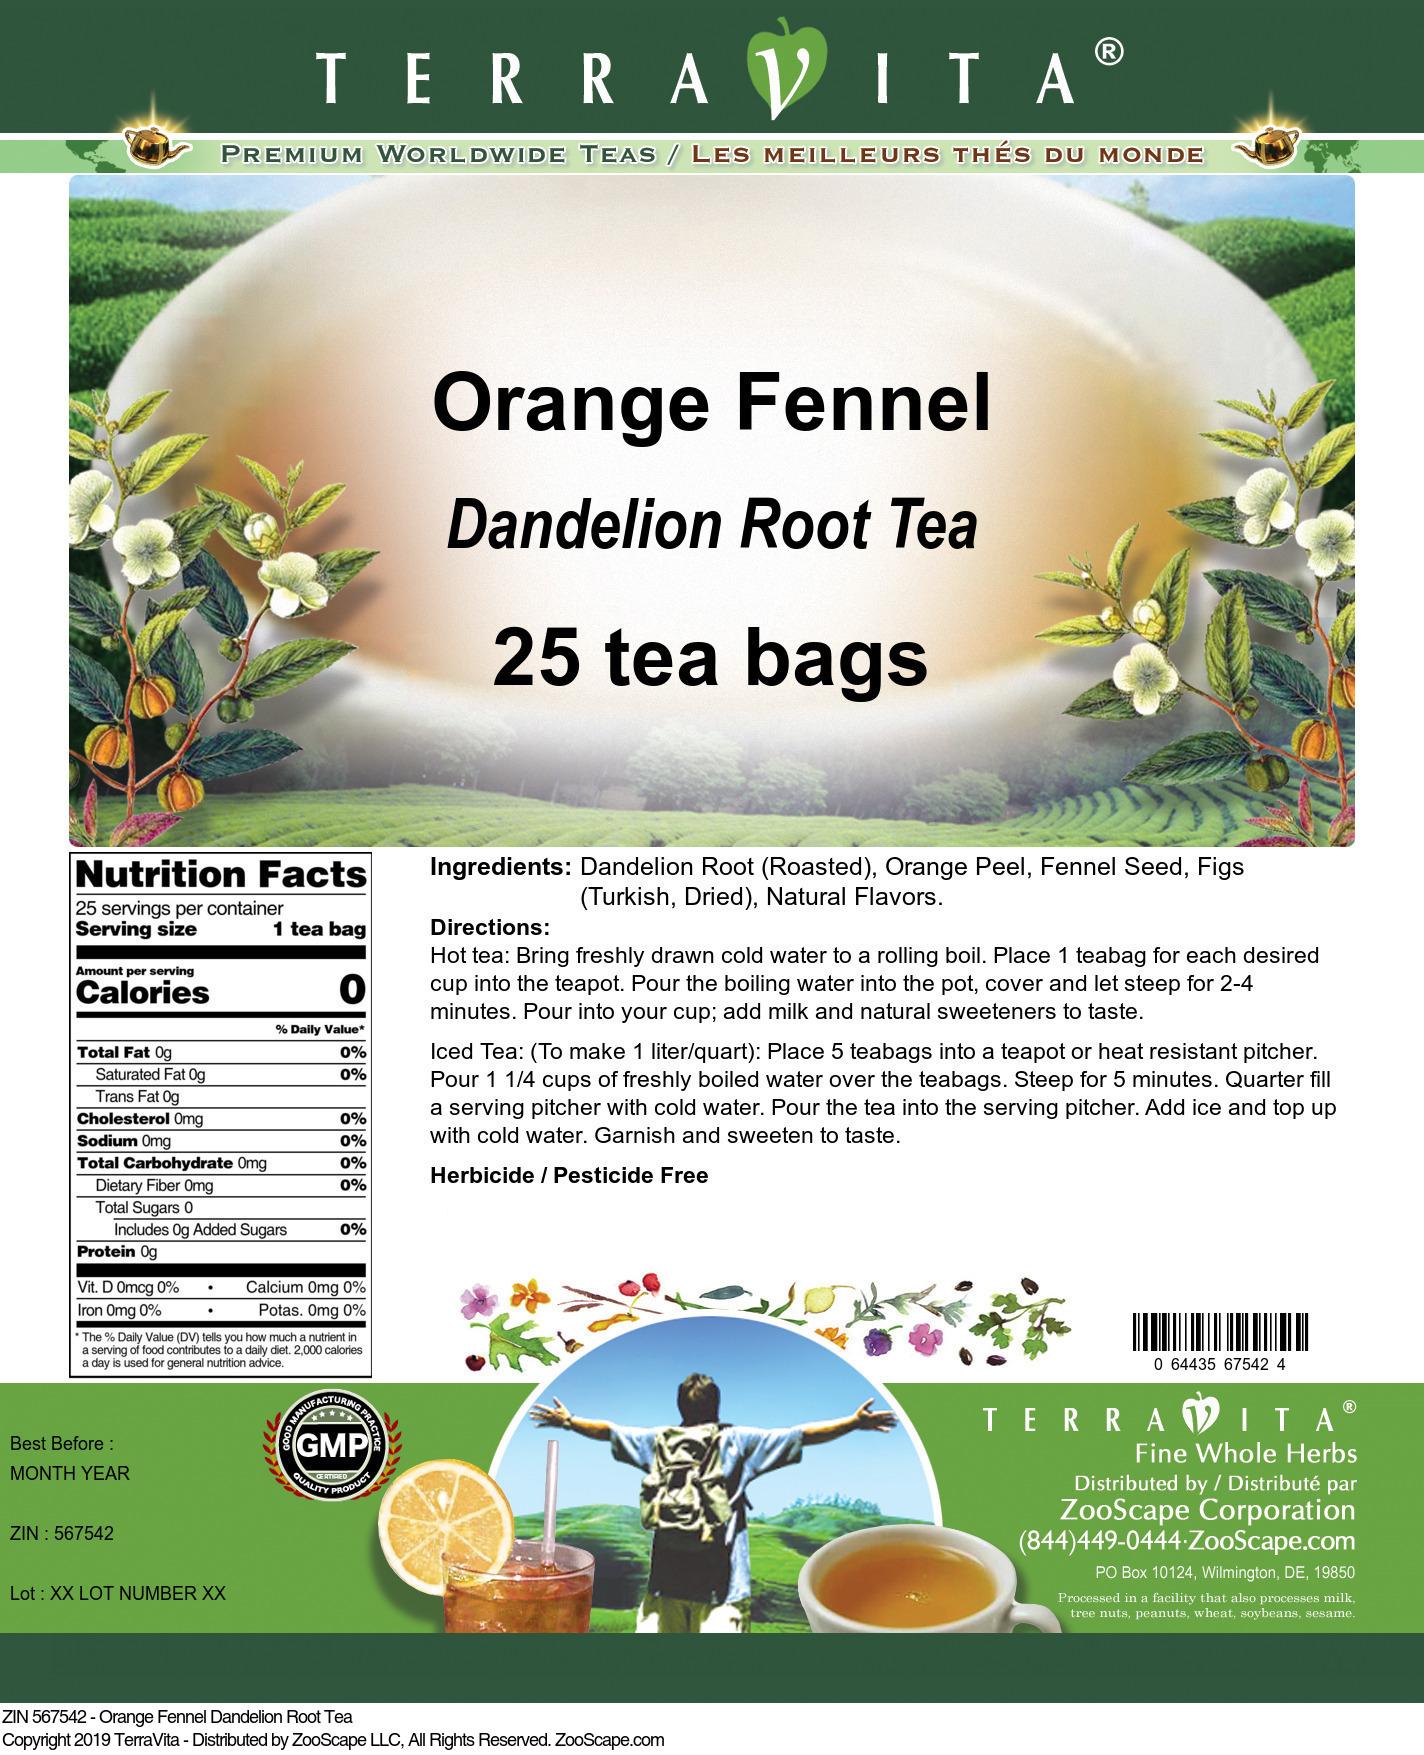 Orange Fennel Dandelion Root Tea